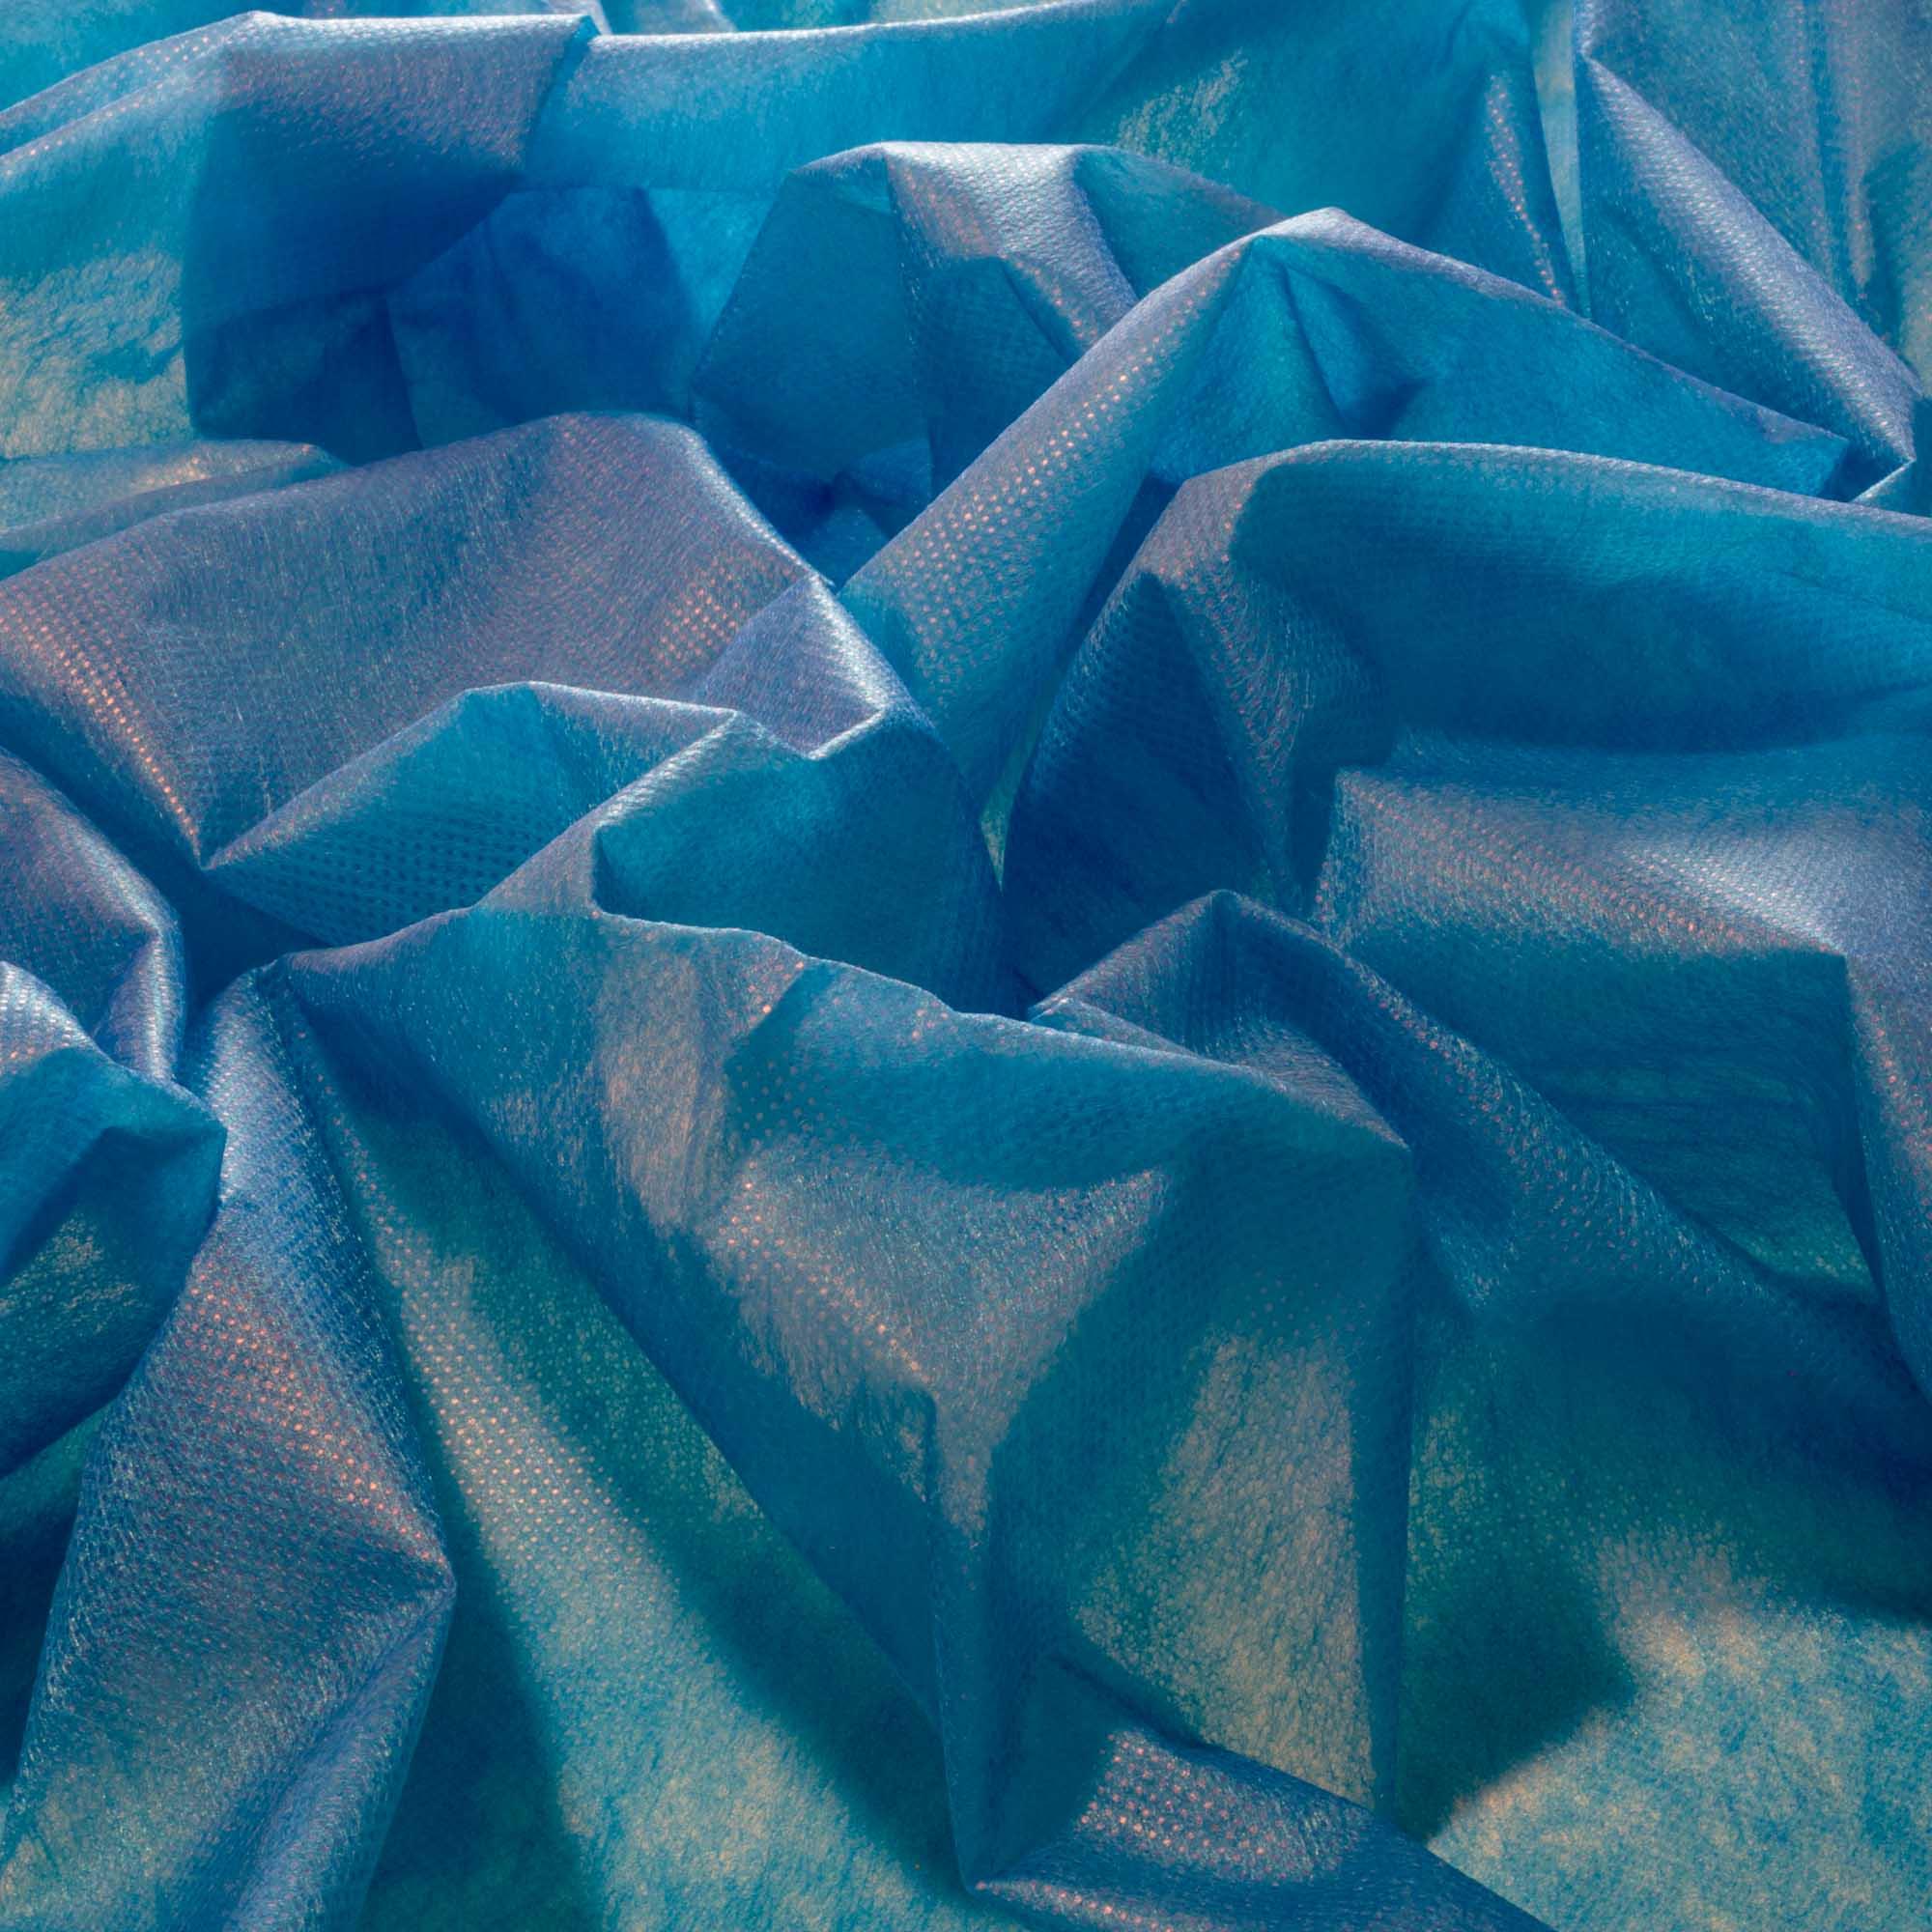 Tecido TNT Azul Royal 100% Poliamida 1,40 m Largura